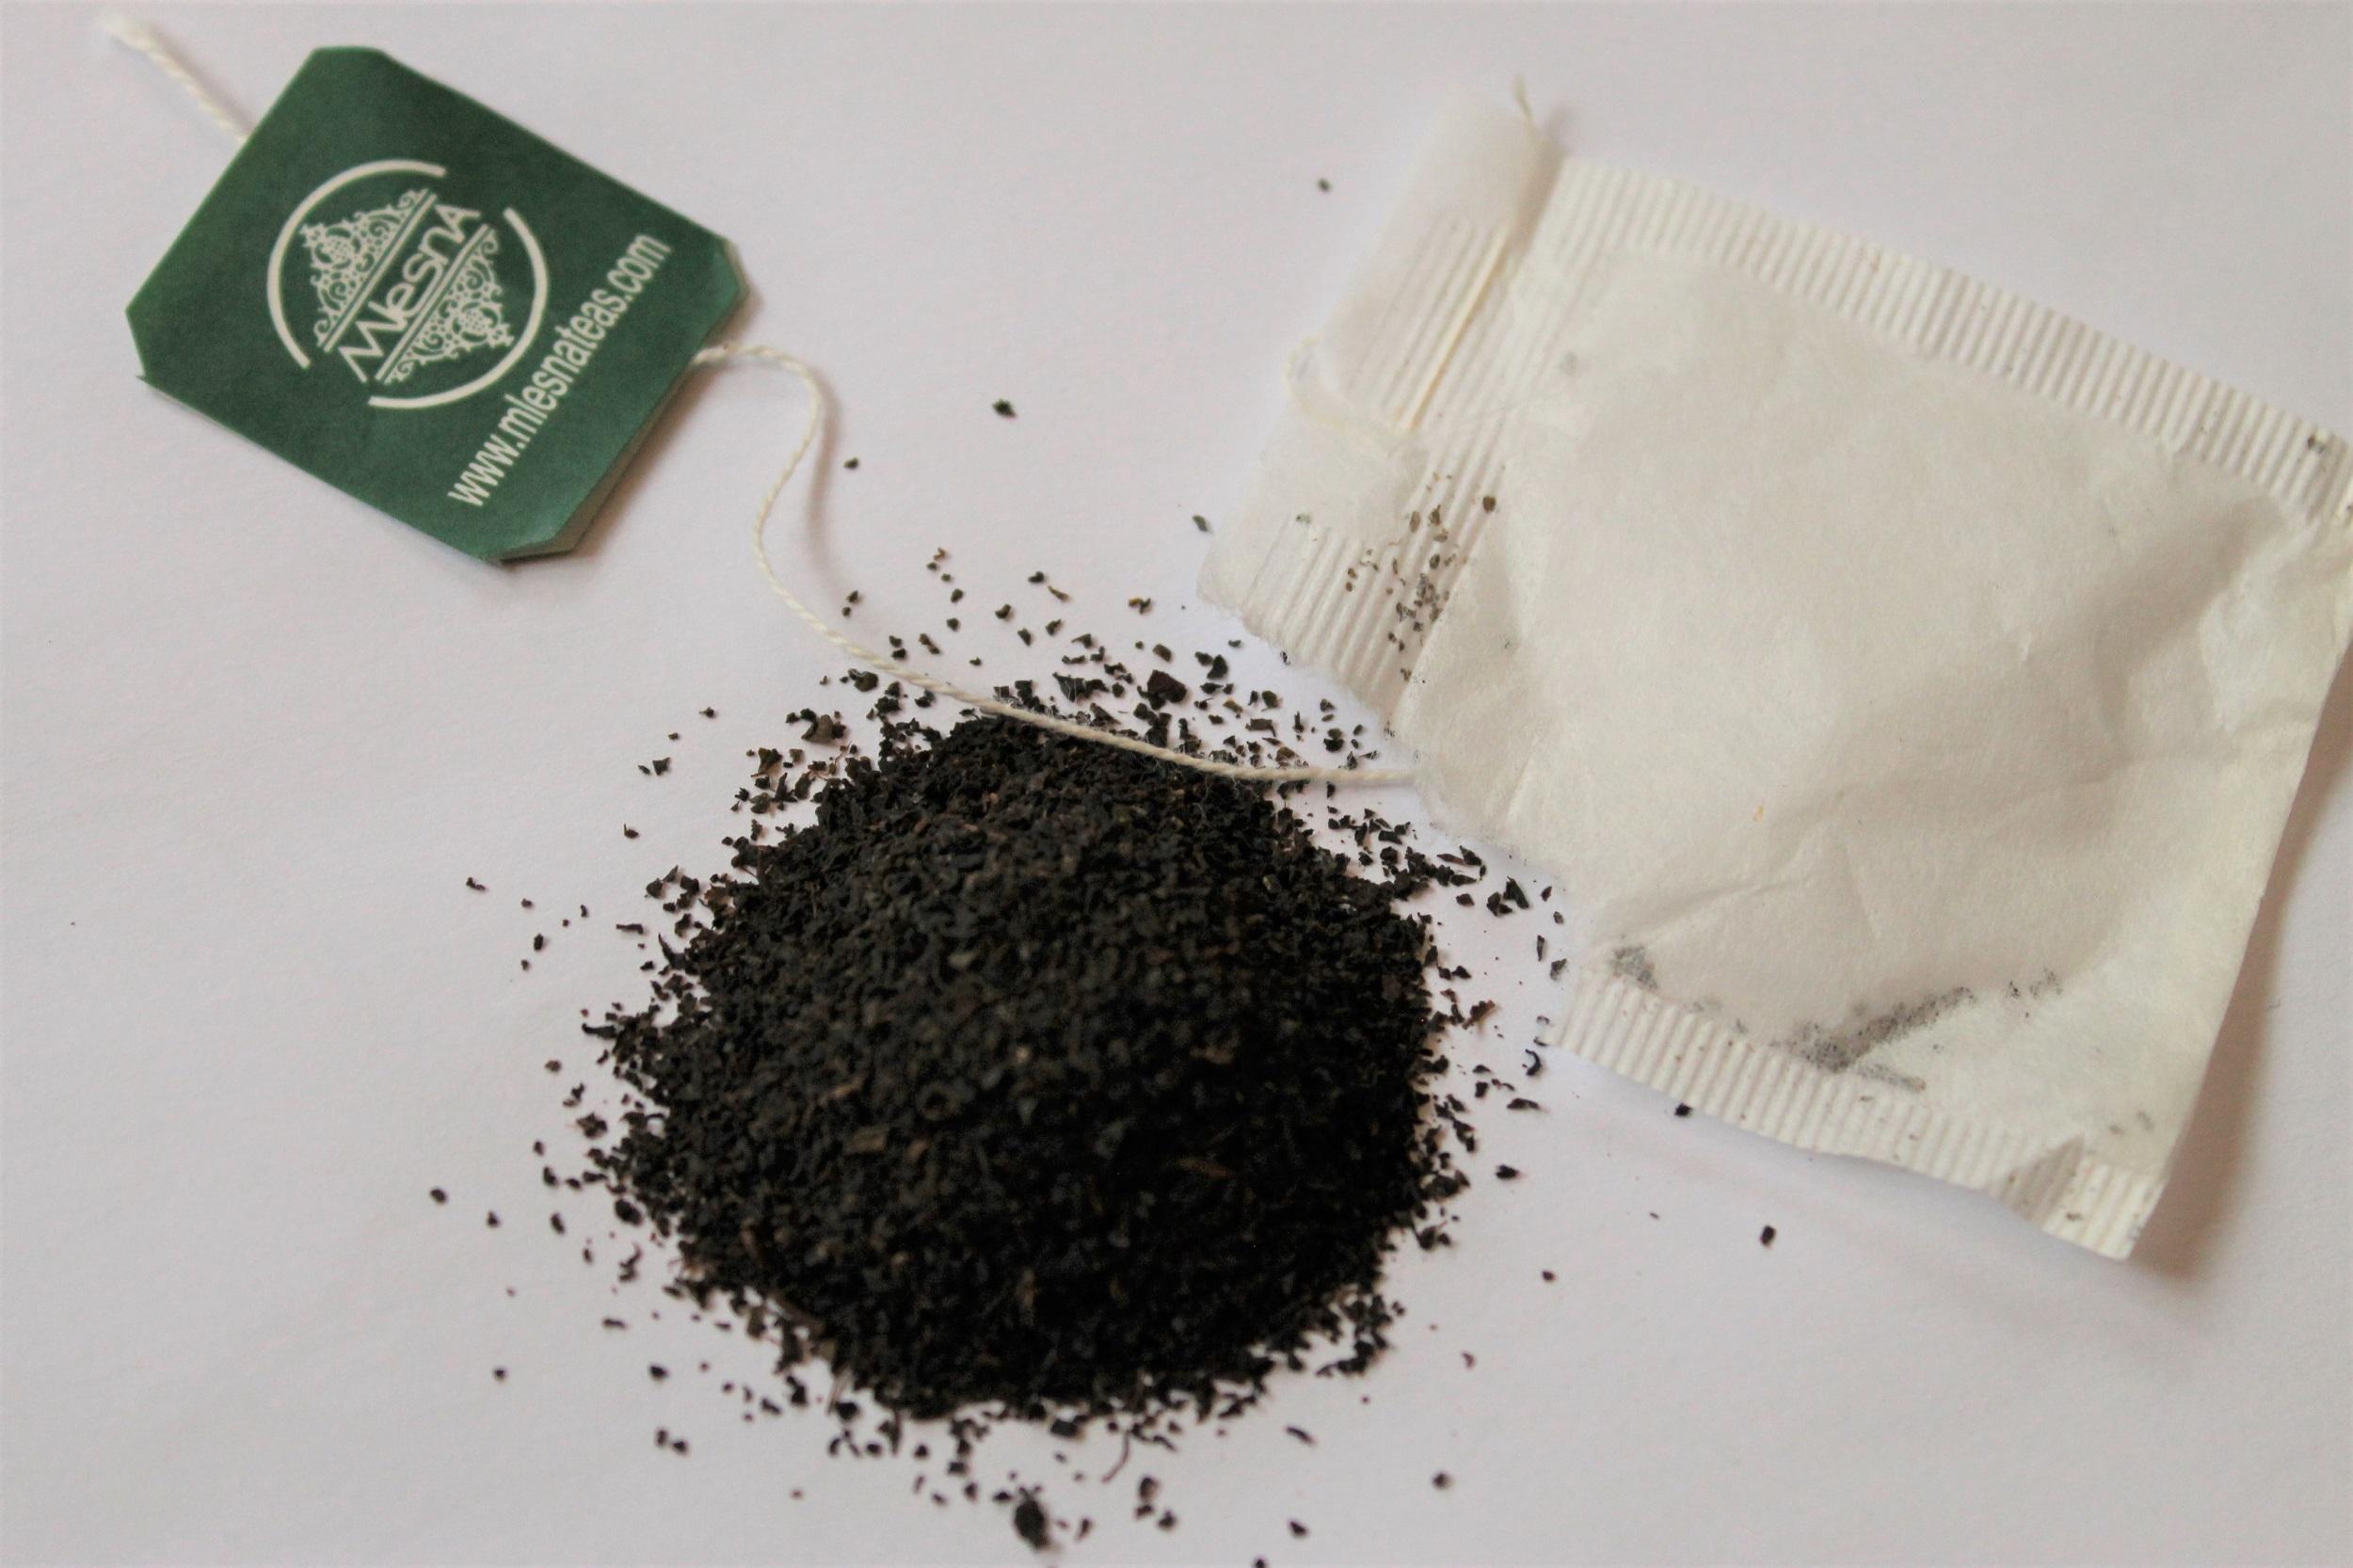 black tea from uva sri lanka